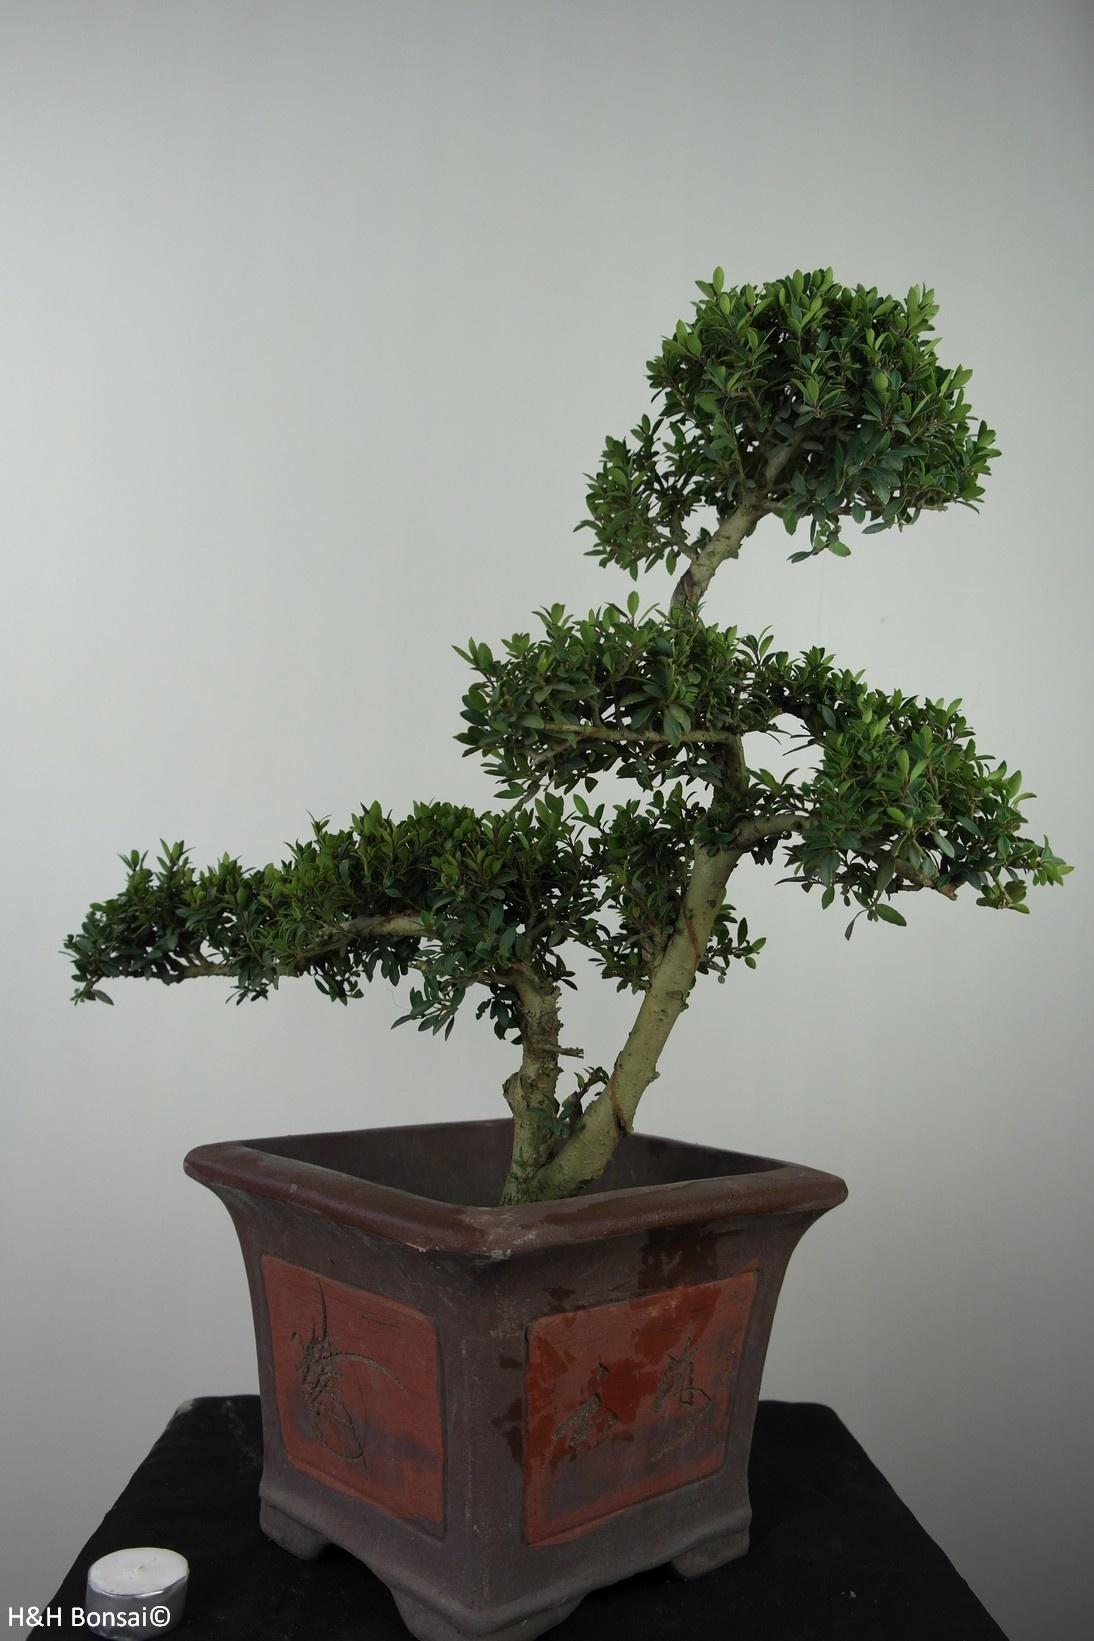 Bonsai Japanische Stechpalme, Ilex crenata, nr. 7746